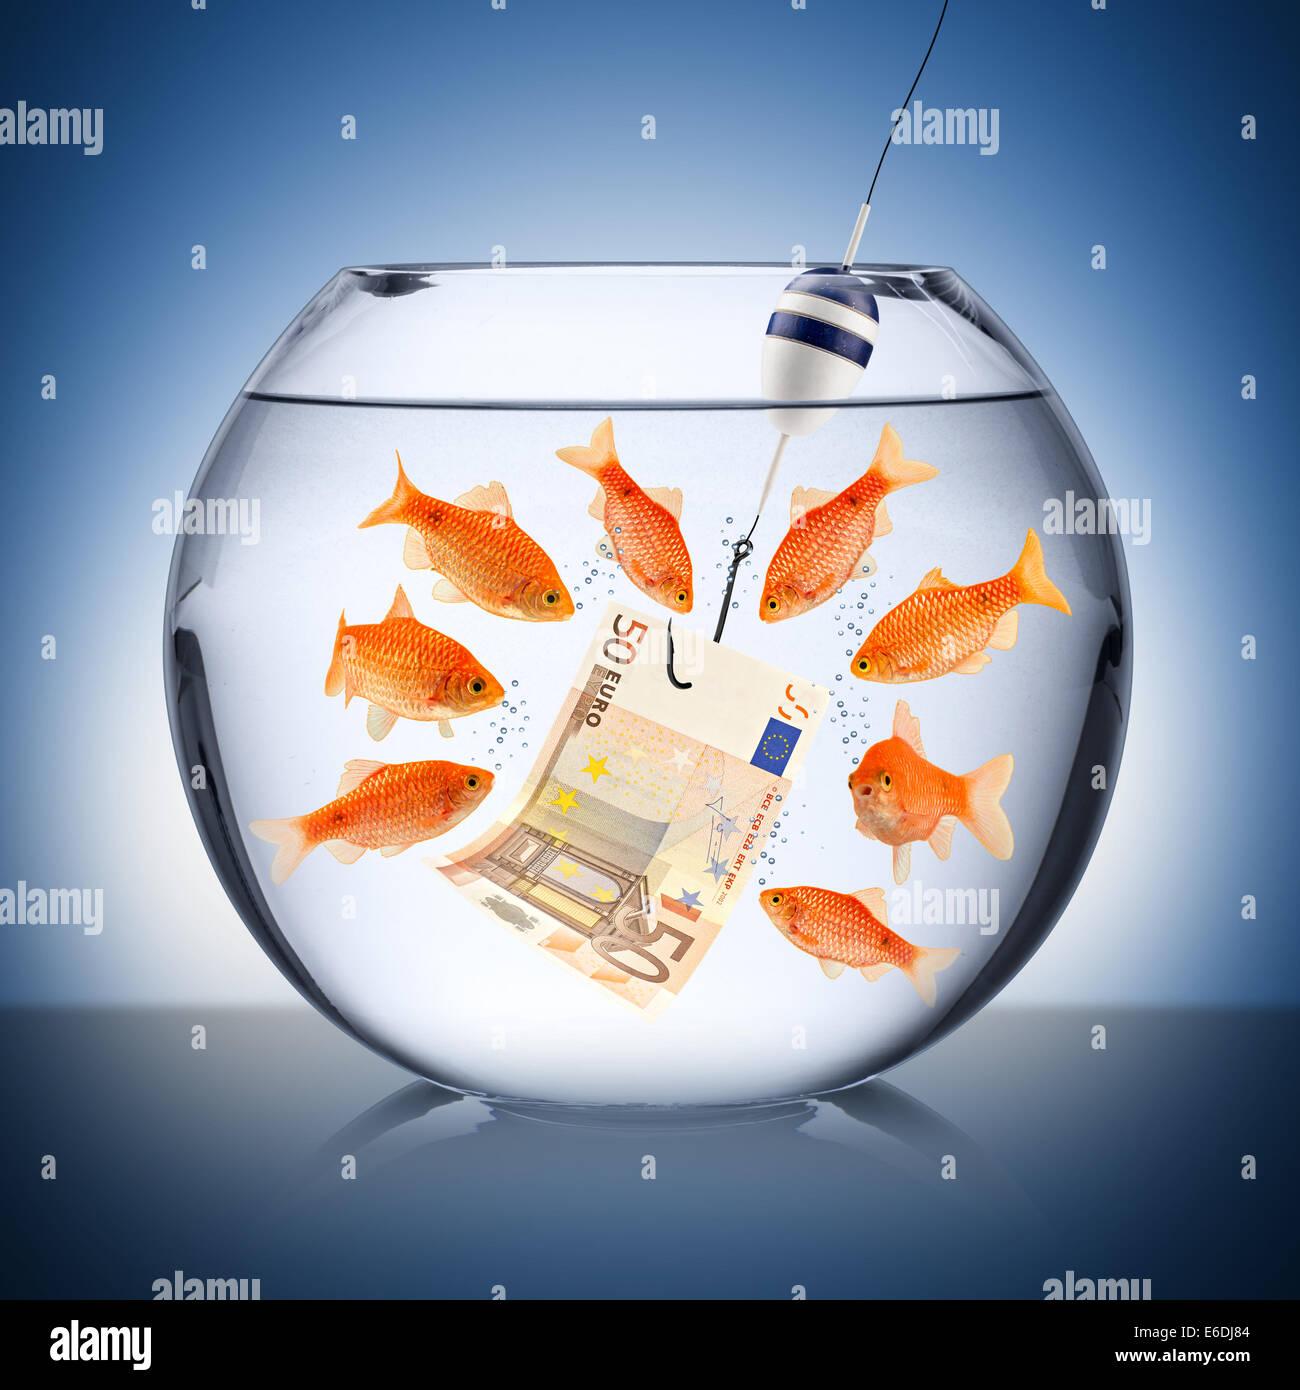 fish temptation concept - Stock Image